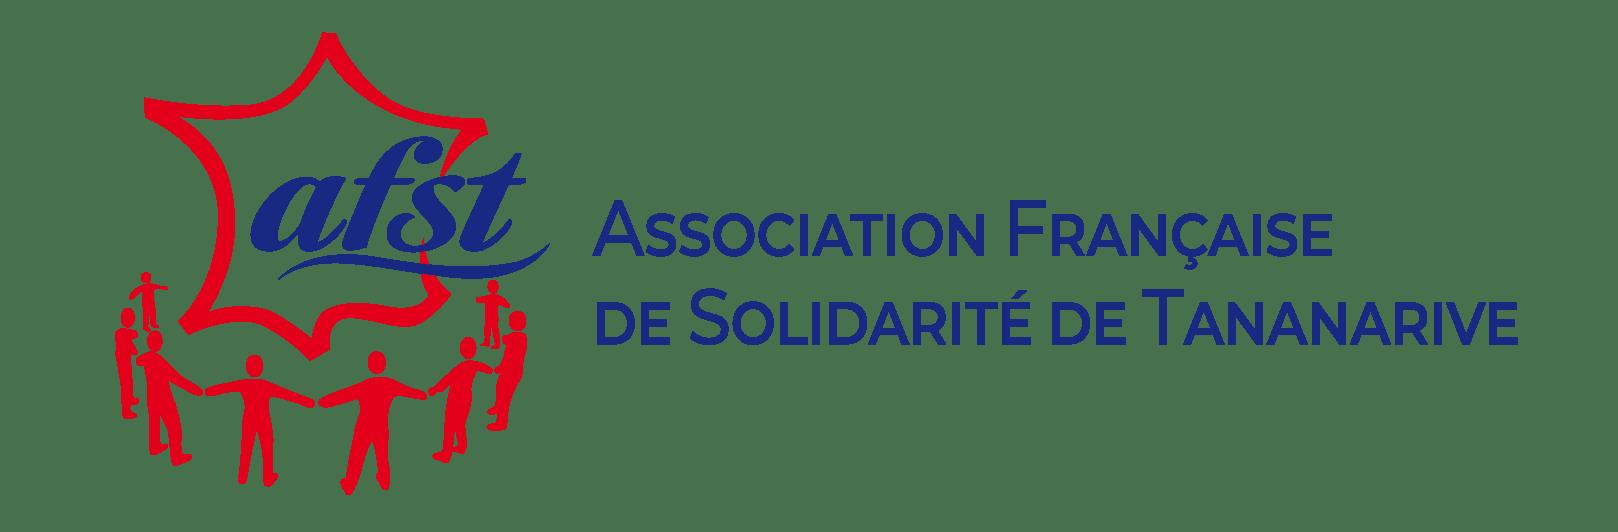 Association Française de Solidarité de Tananarive